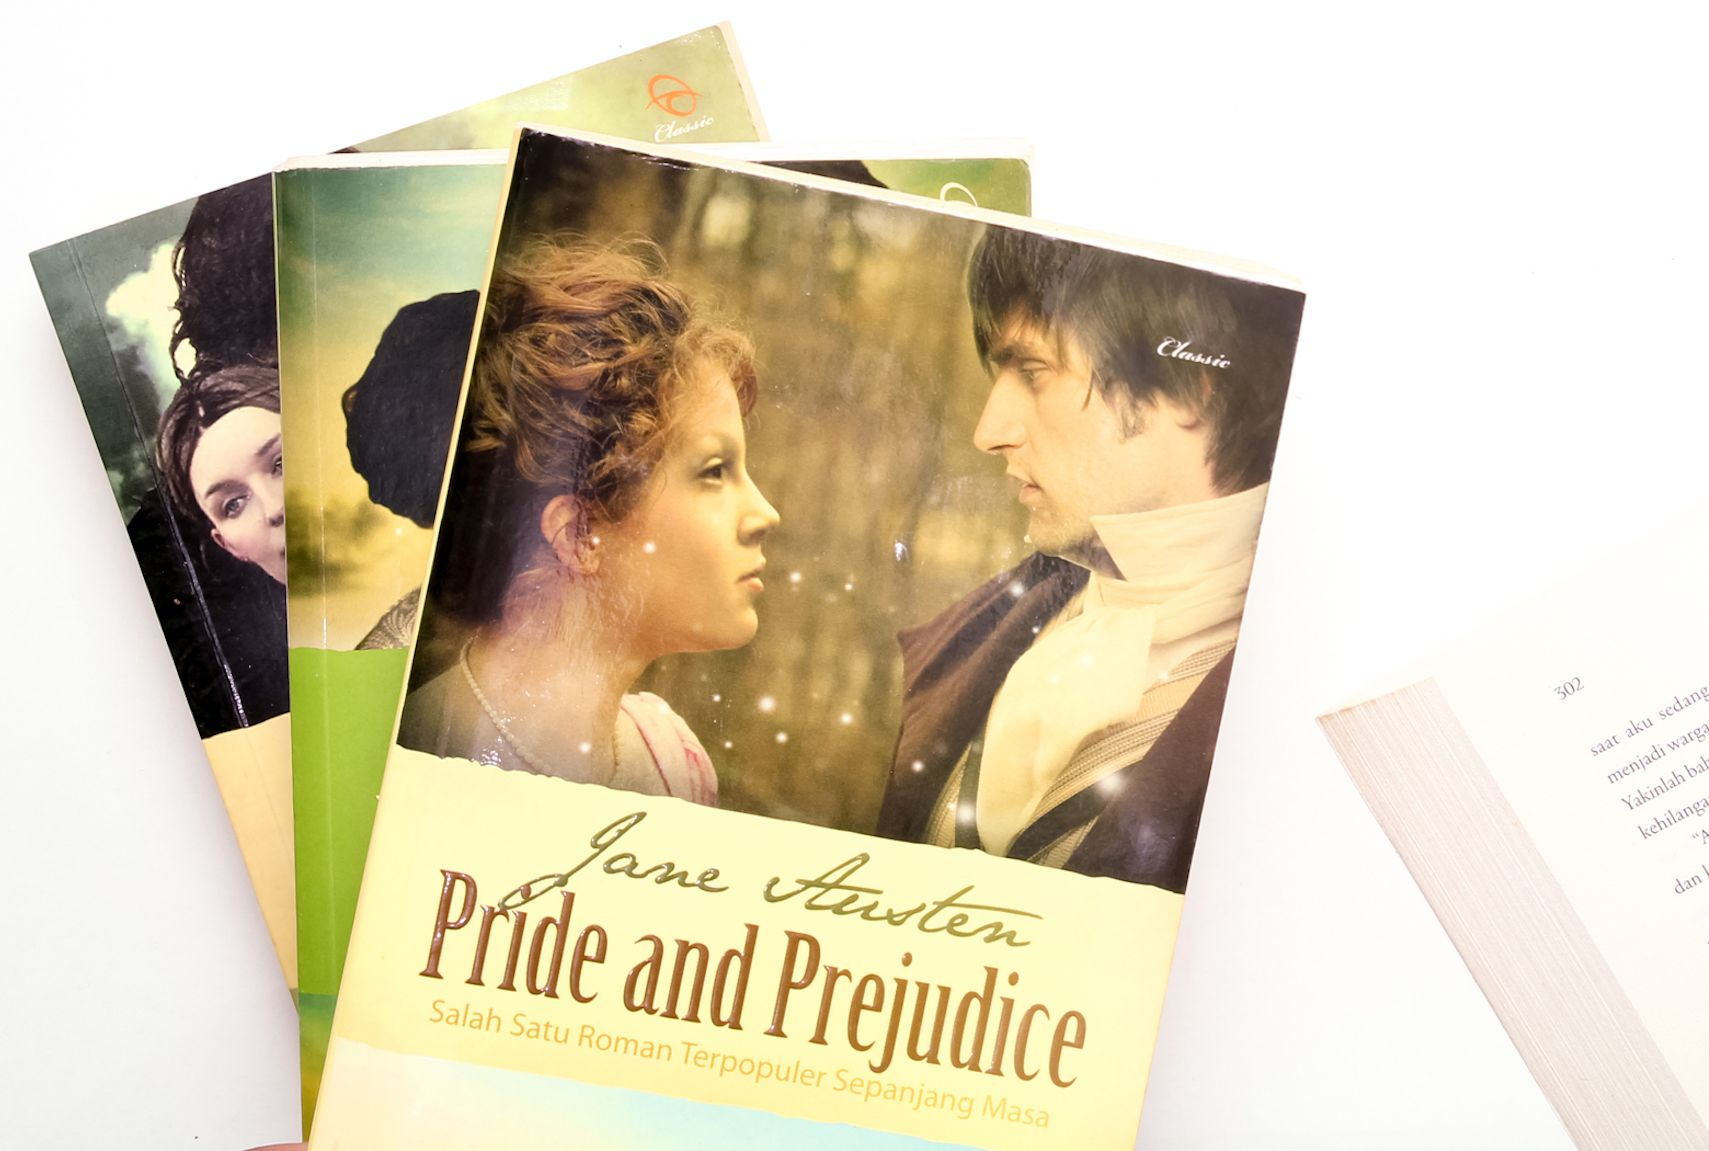 10 Great Books Like Pride and Prejudice